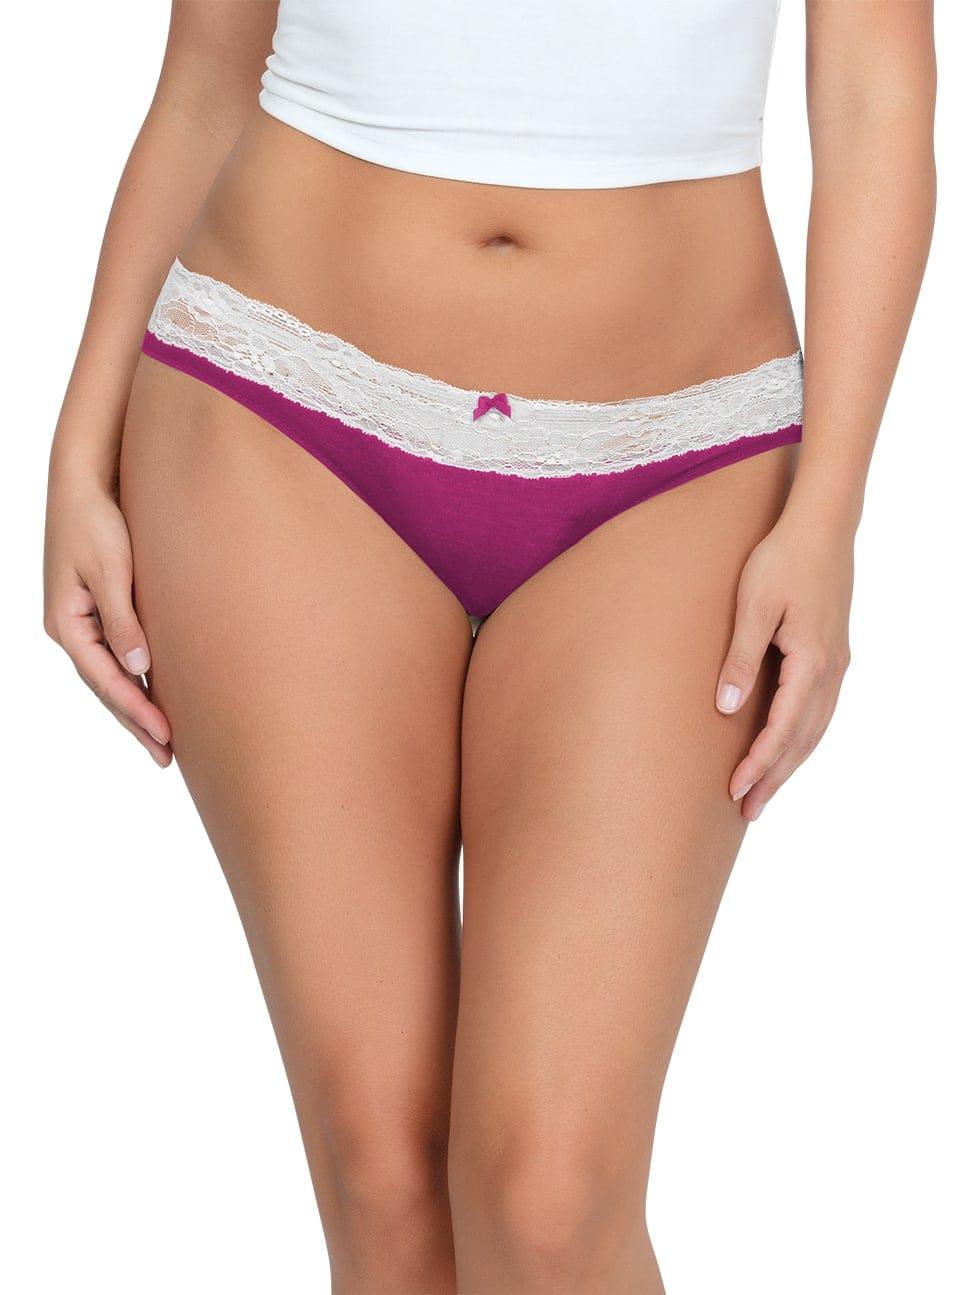 PARFAIT ParfaitPanty SoEssential BikiniPP303 WildPinkIvory Front - Panty So Essential Bikini- Wild Pink - PP303